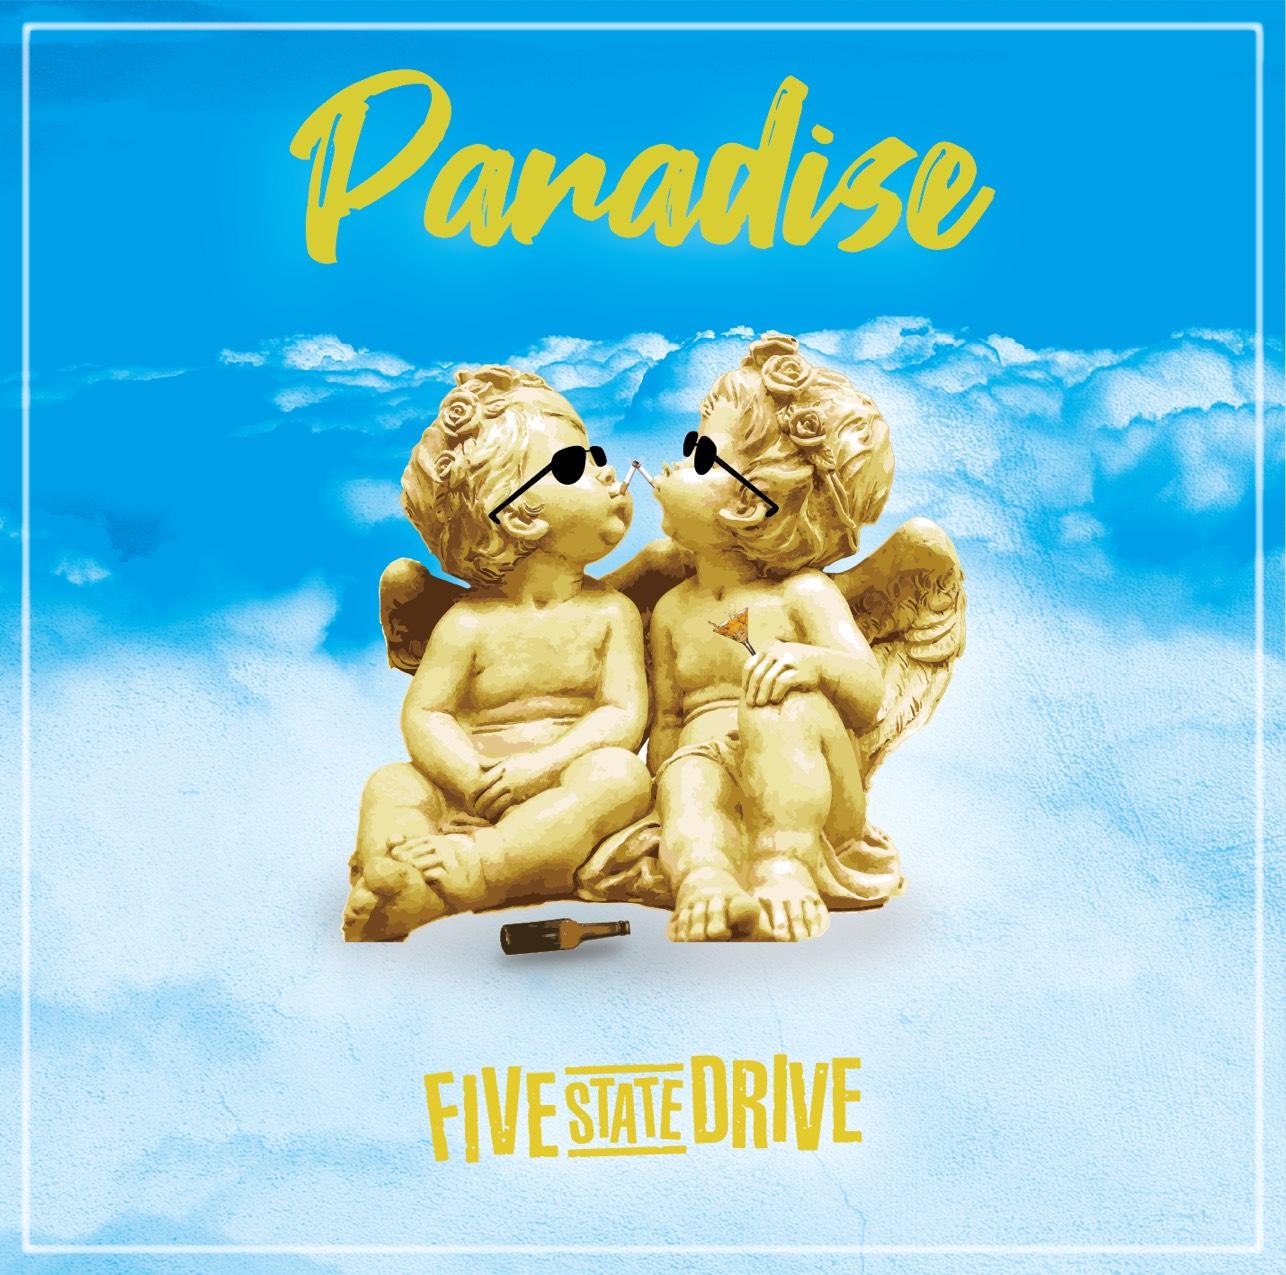 【ZOO特典あり】Five State Drive / Paradise